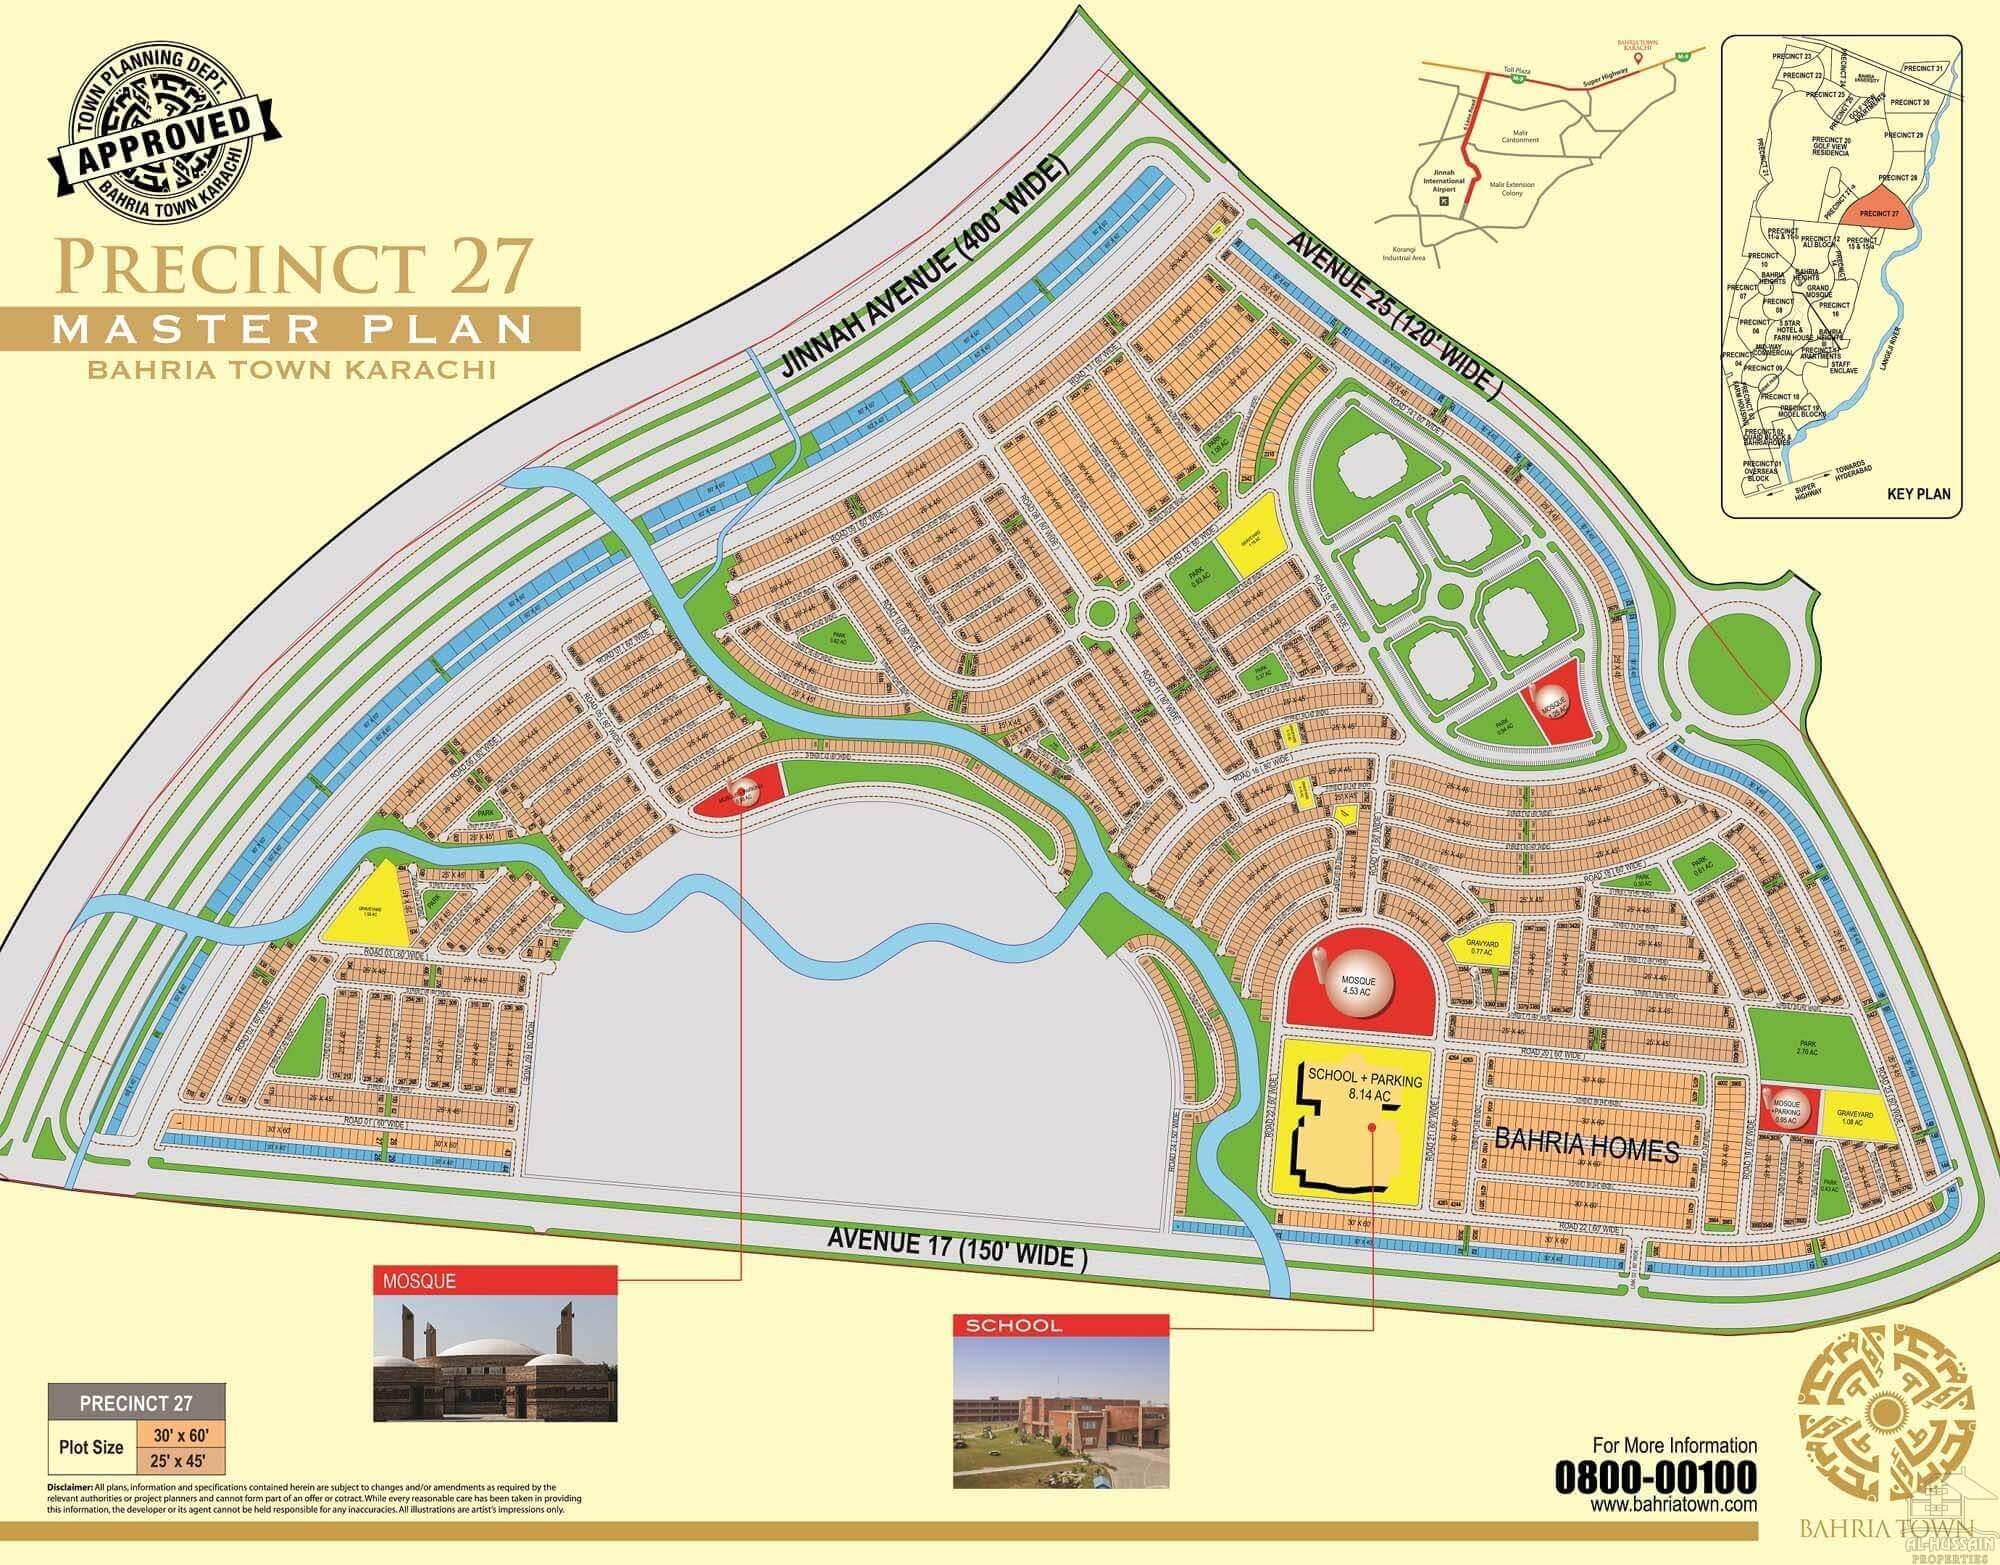 Precinct 27 Master Plan